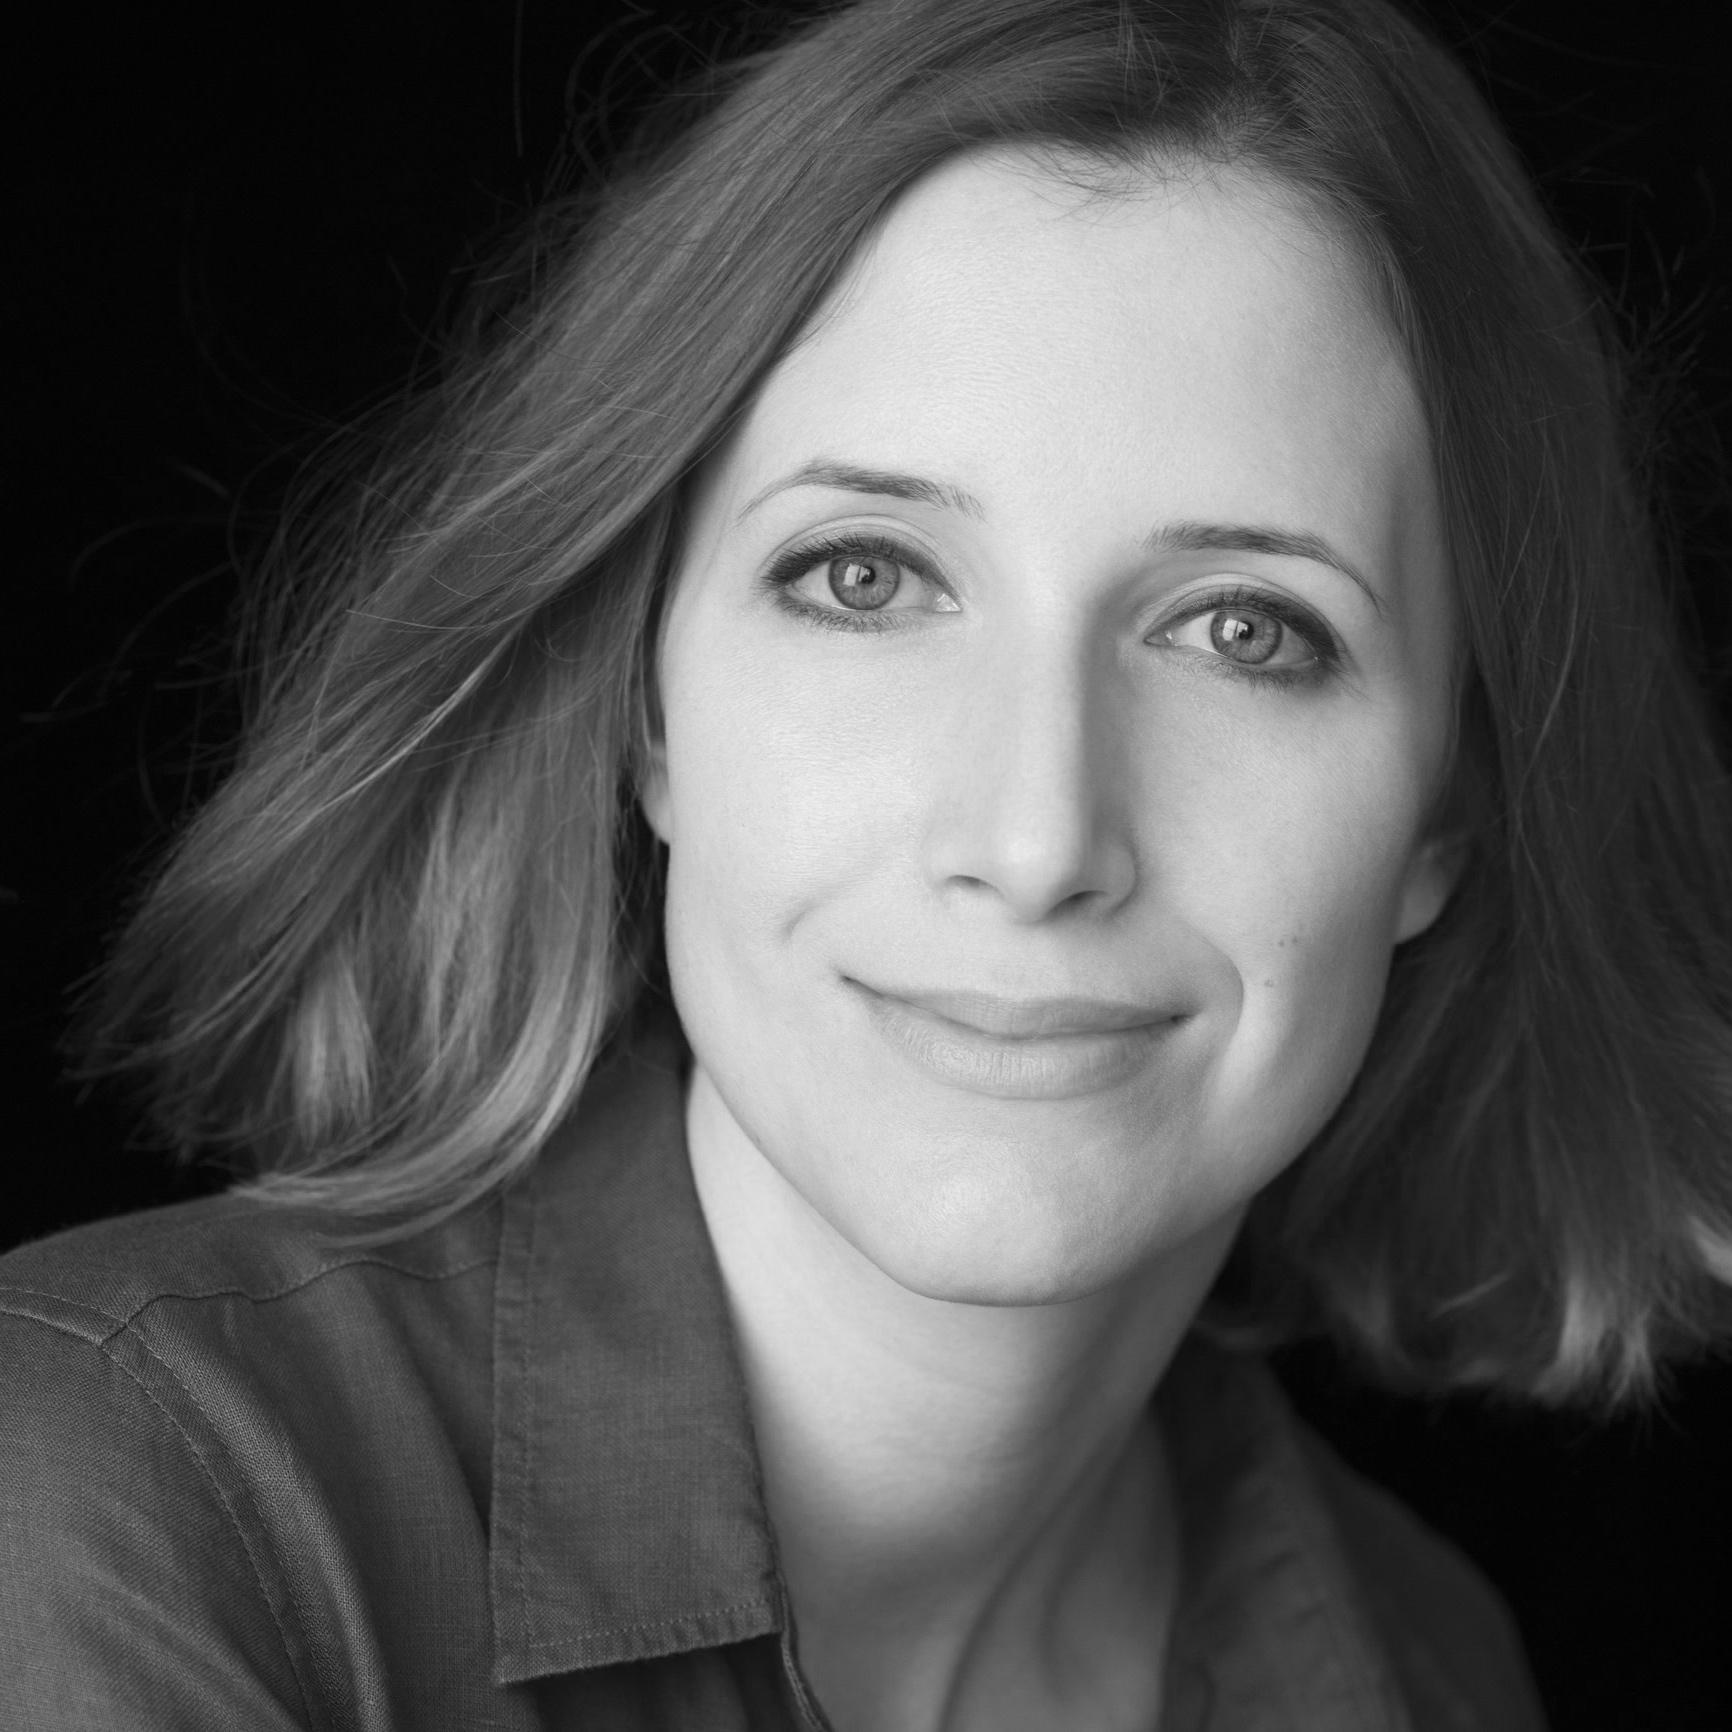 Sofia Larsson - Soprano